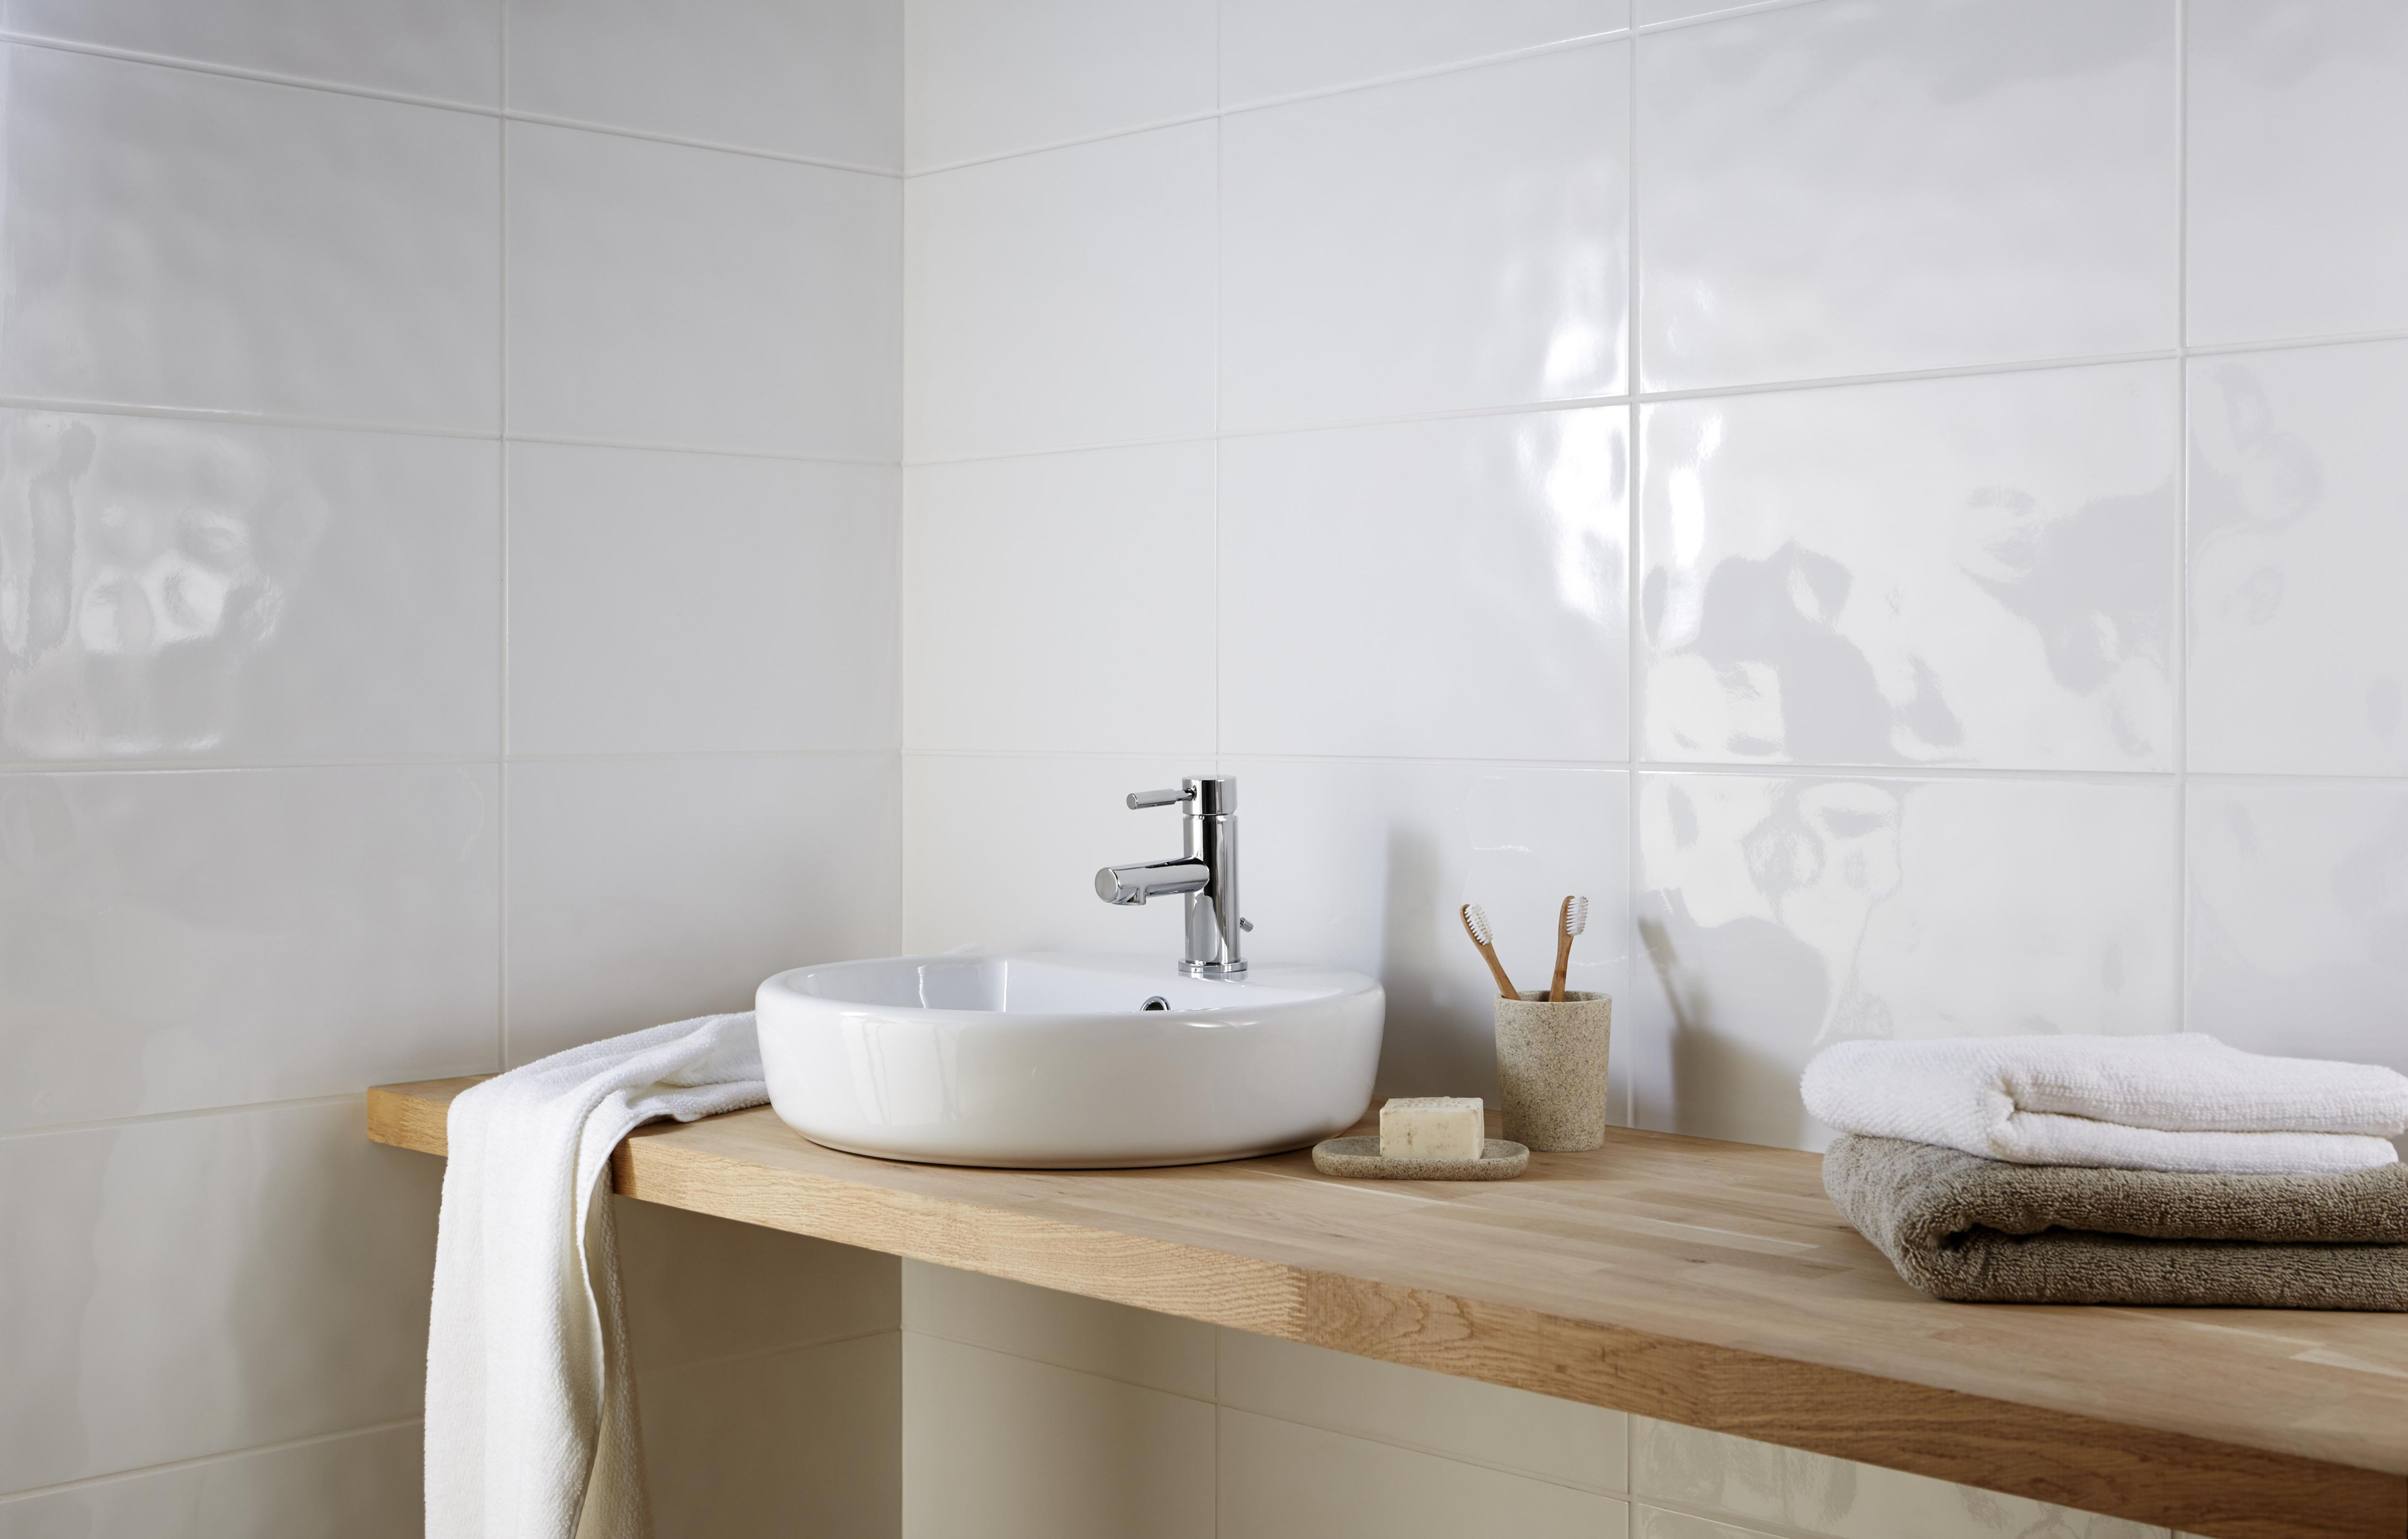 countertop basins